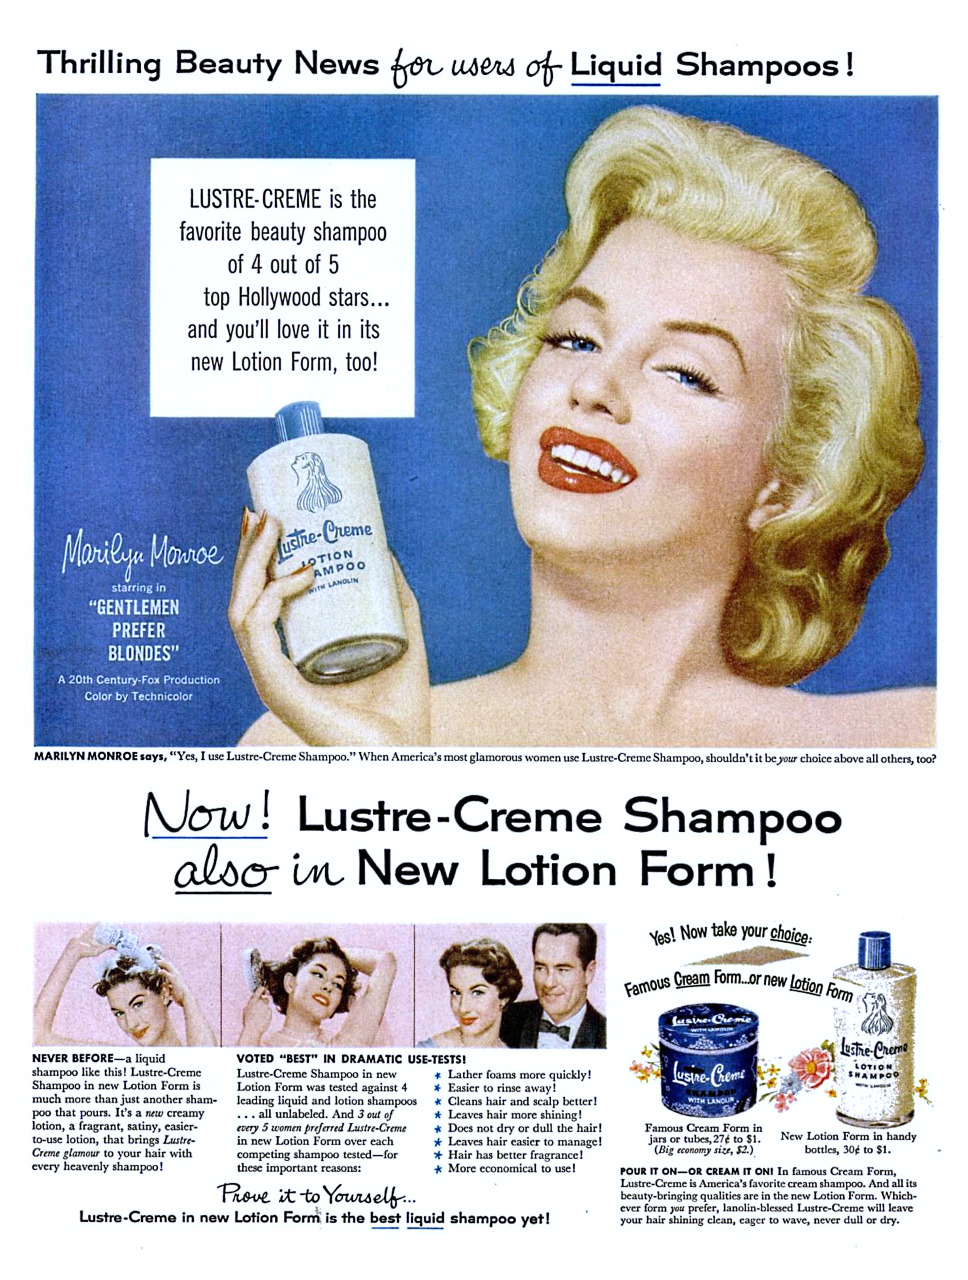 Lustre-Cream Shampoo featuring Marilyn Monroe - 1953